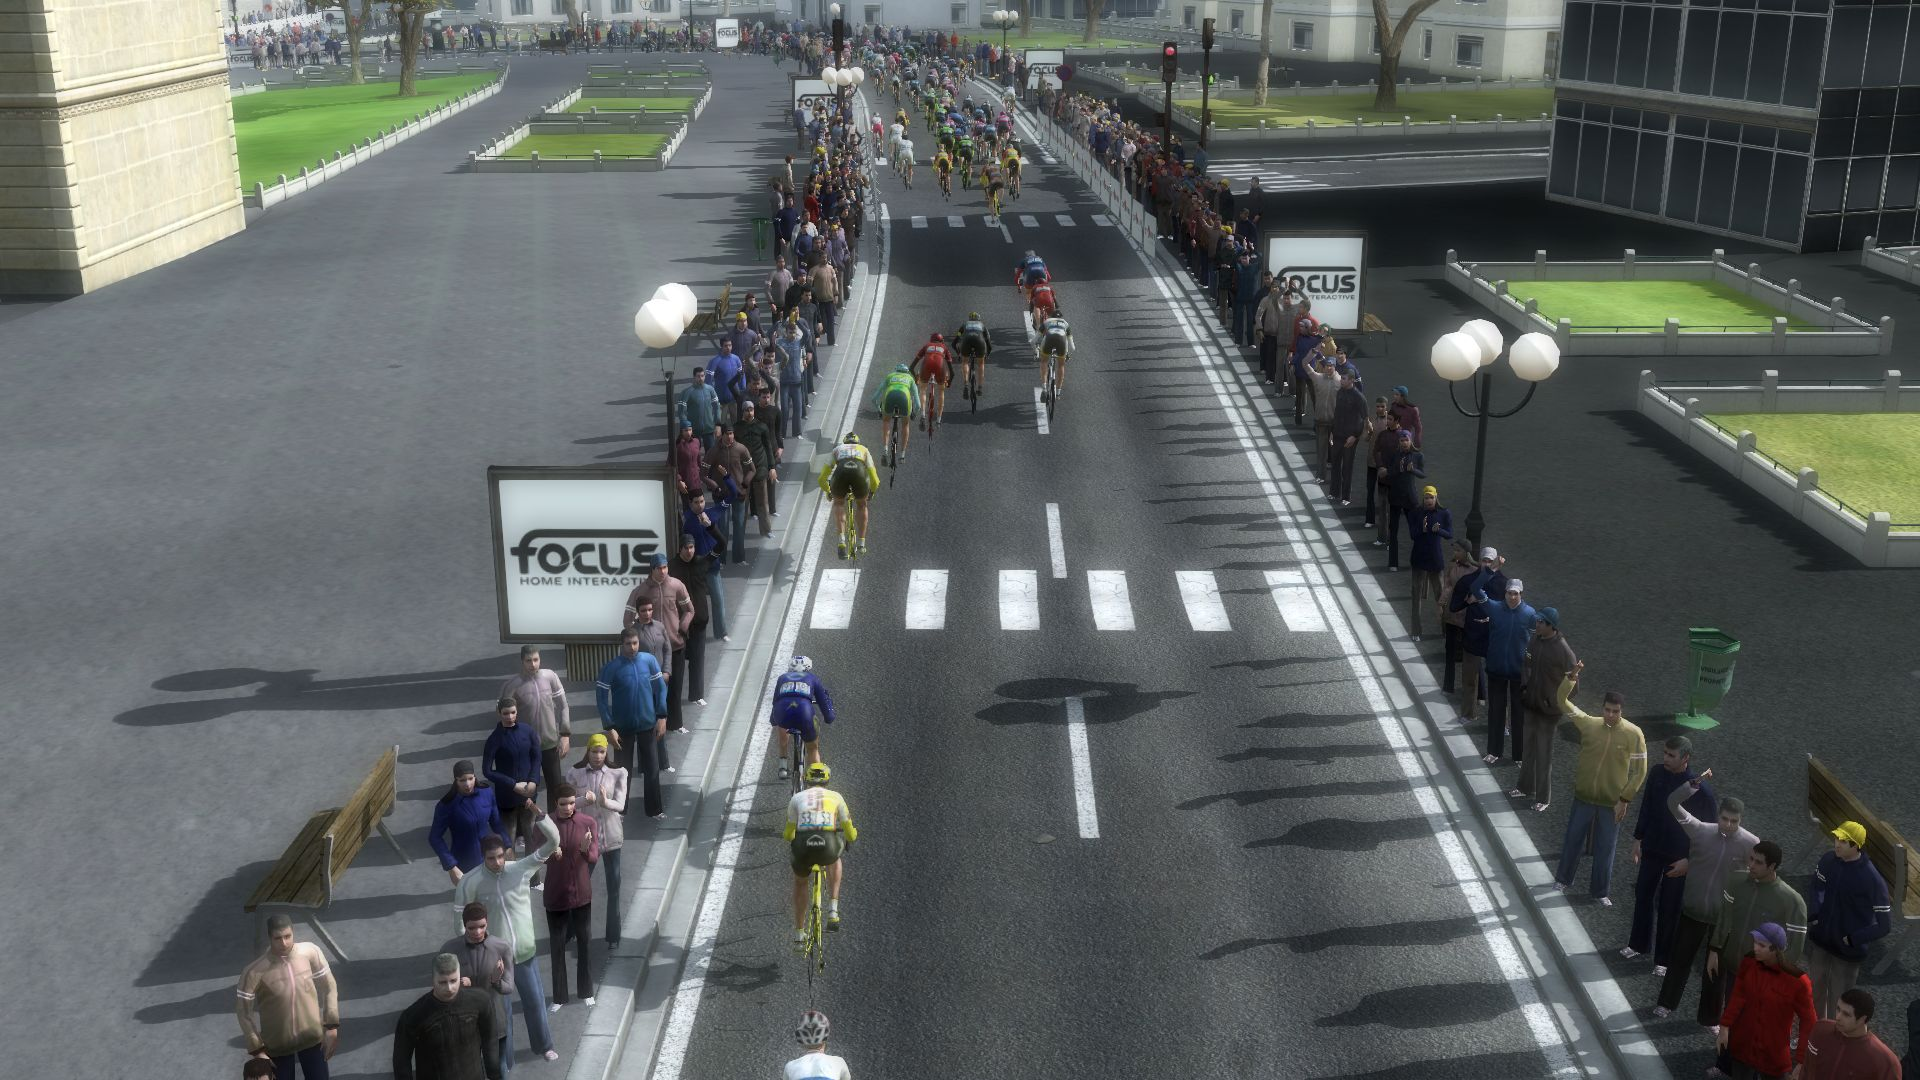 pcmdaily.com/images/mg/2019/Races/PT/Qatar/mg19_qat_s05_10.jpg